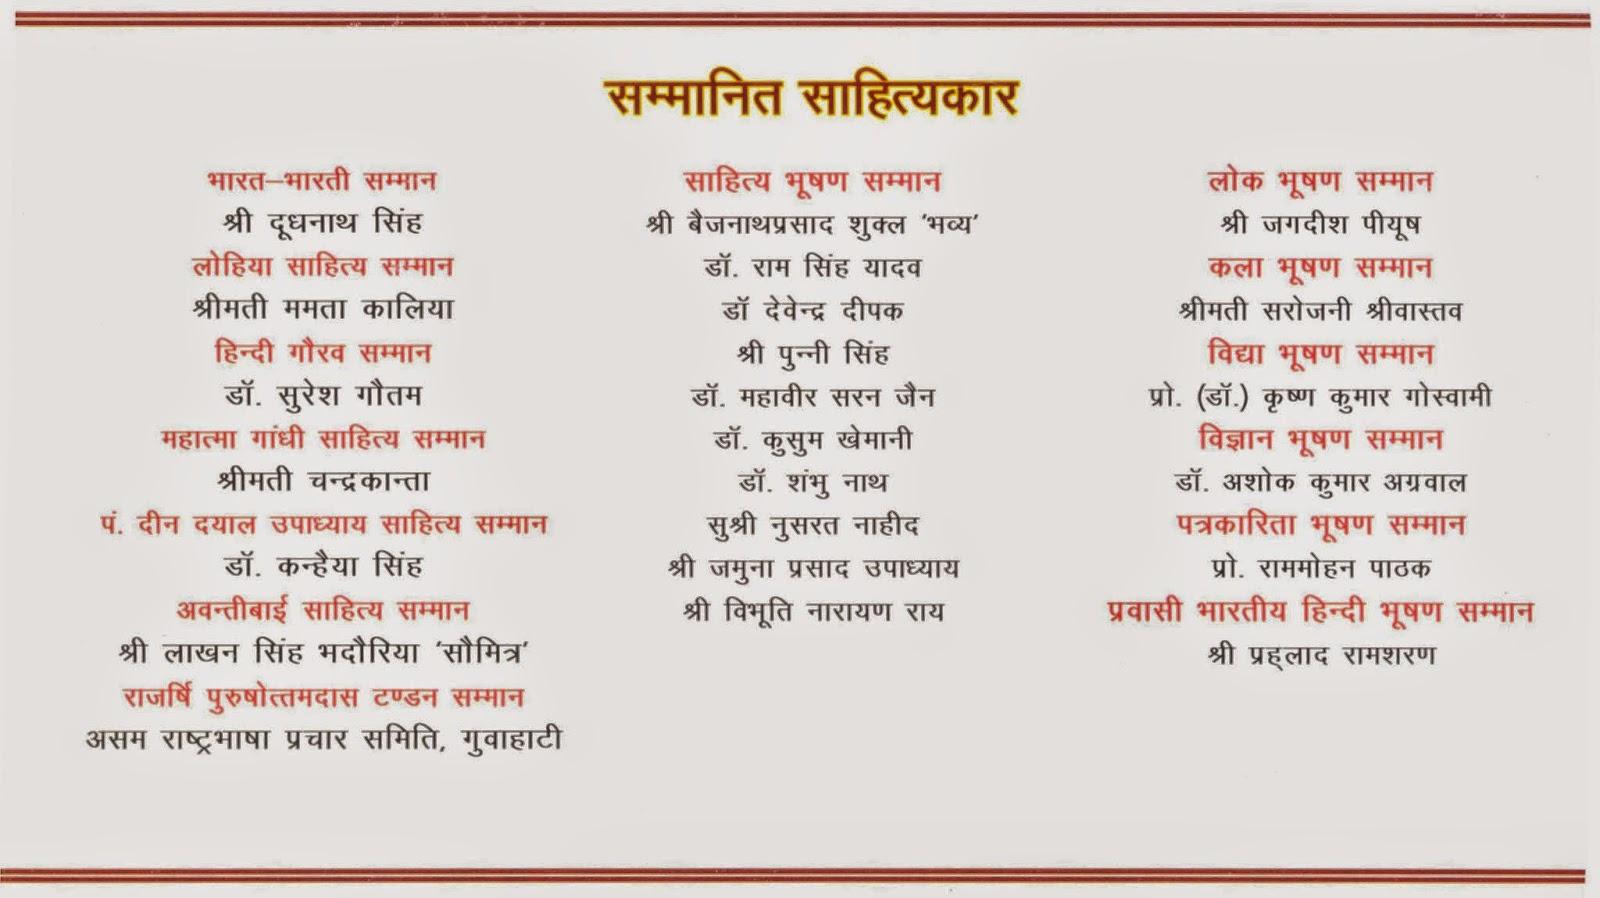 itni shakti hame dena data lyrics in hindi pdf